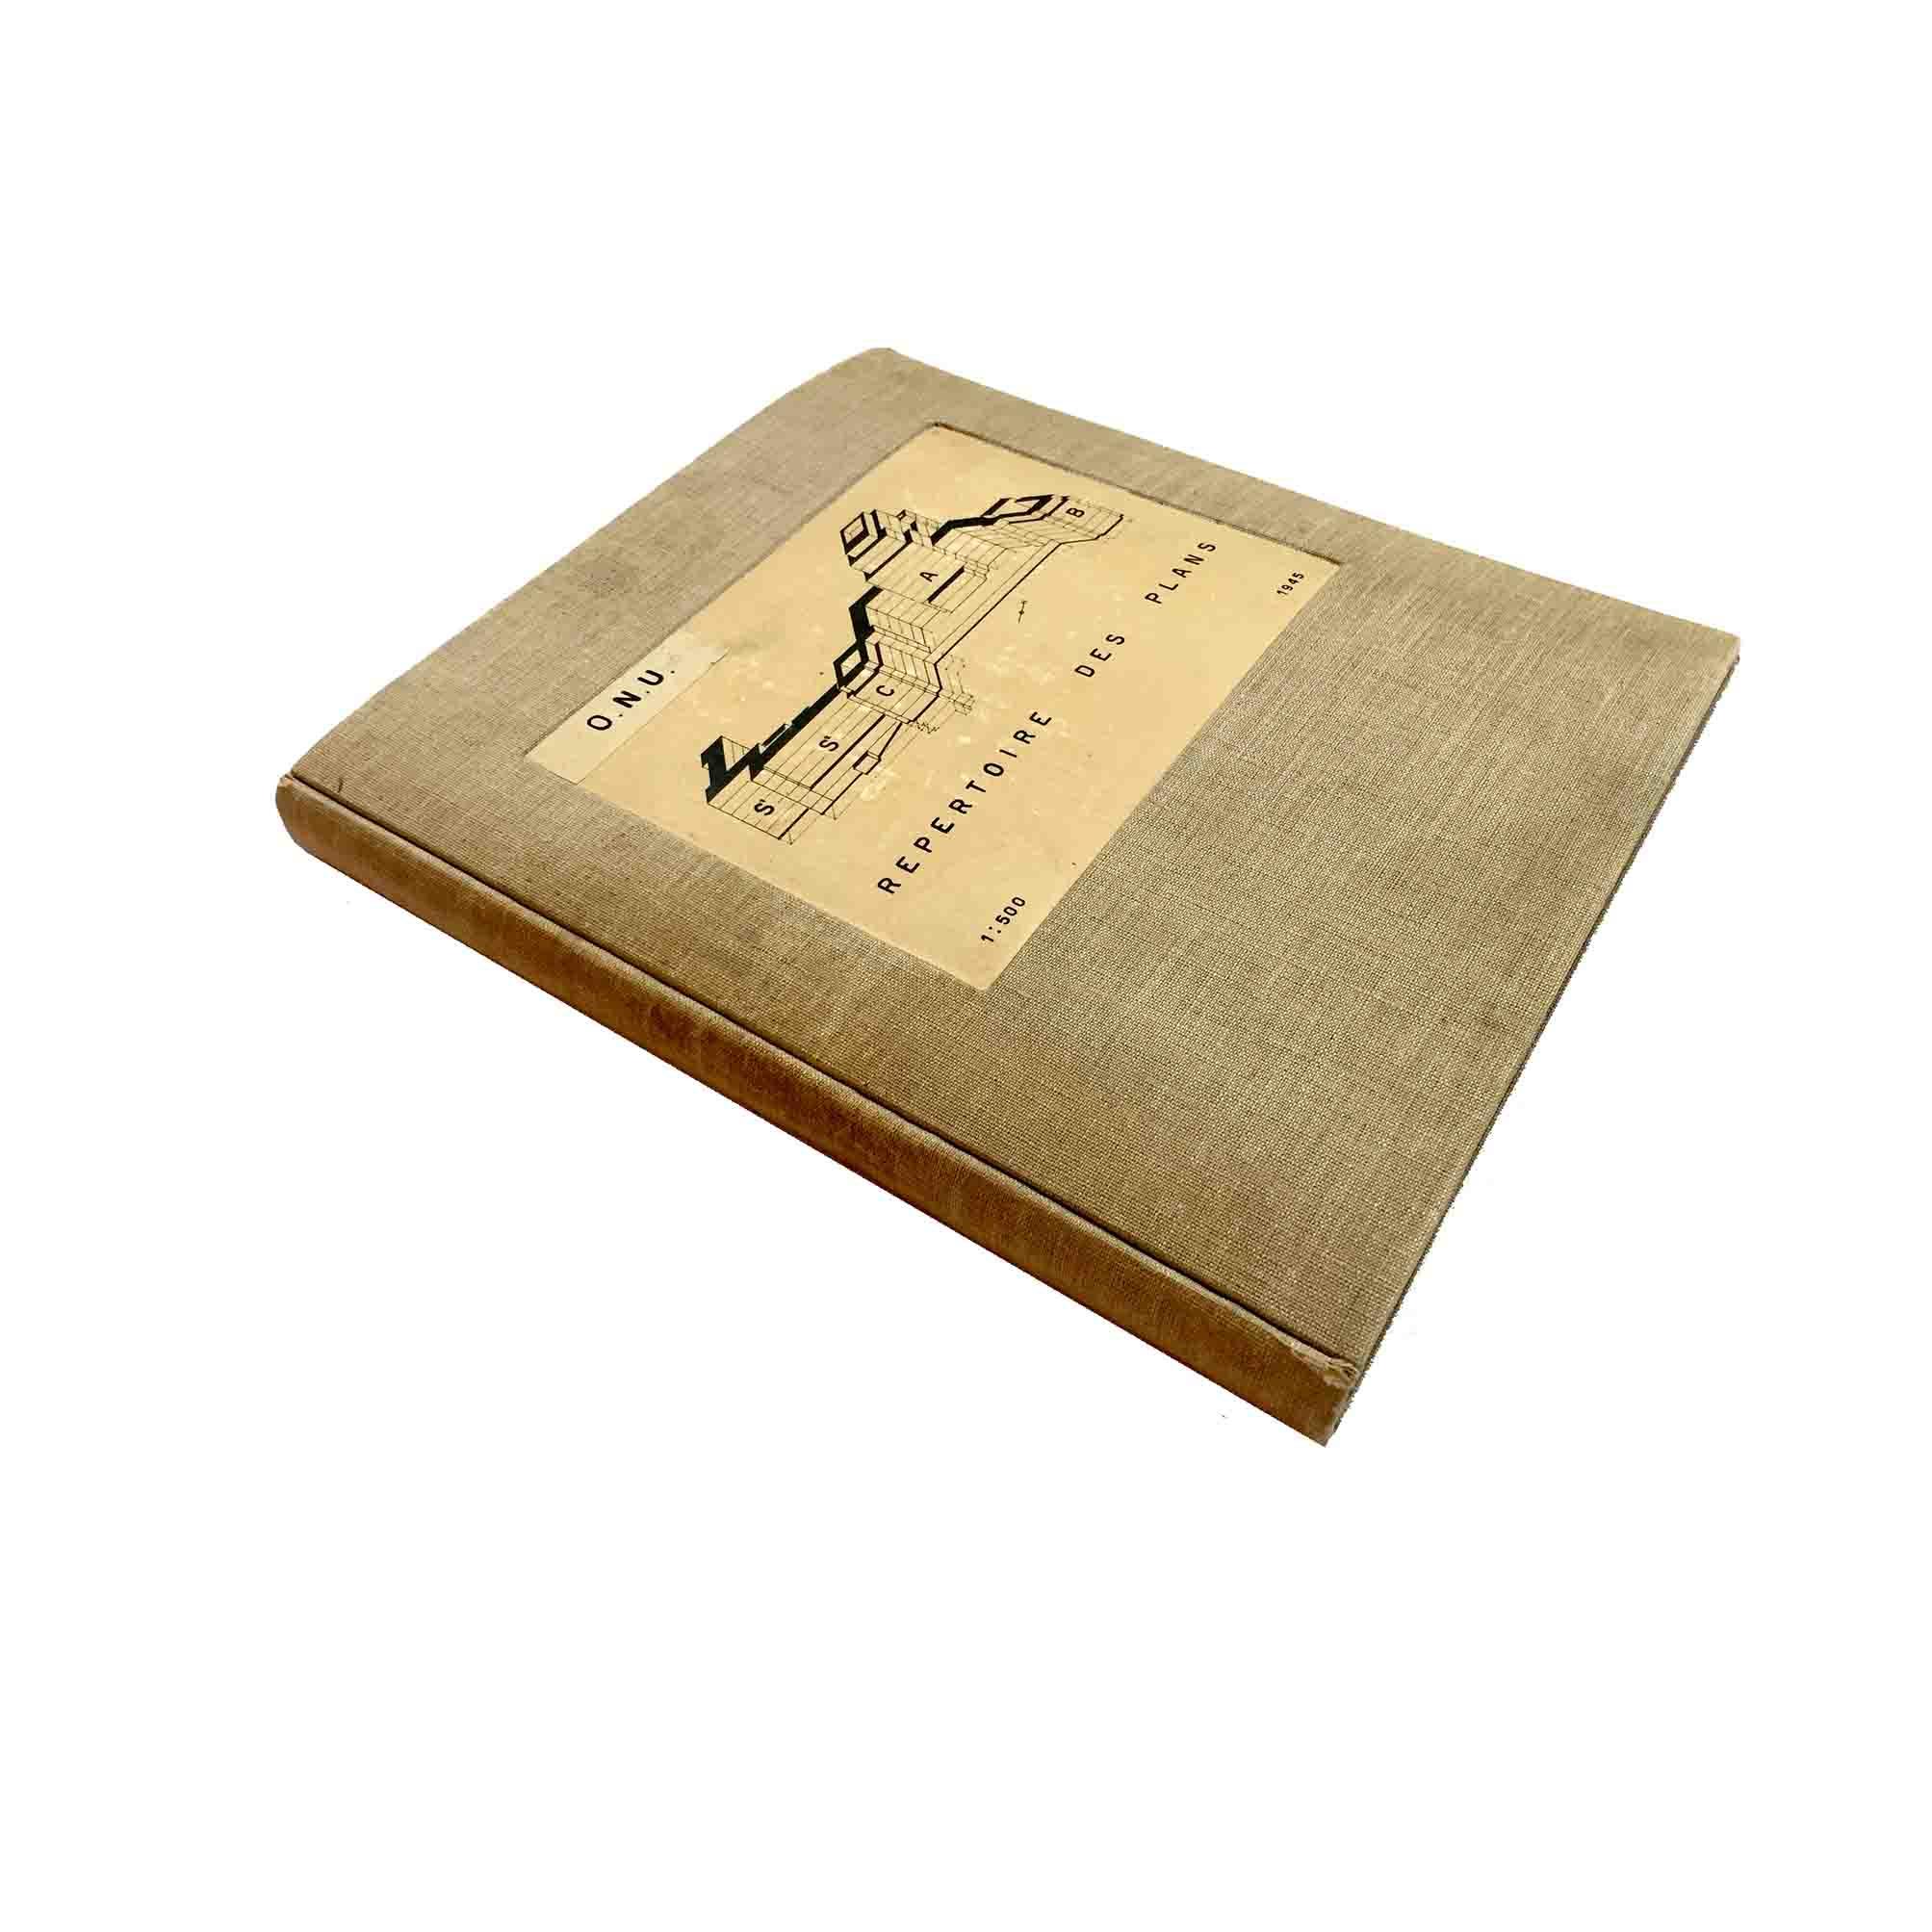 5803-UNO-Geneva-Repertoire-Maps-1945-Front-Cover-2-free-N.jpg